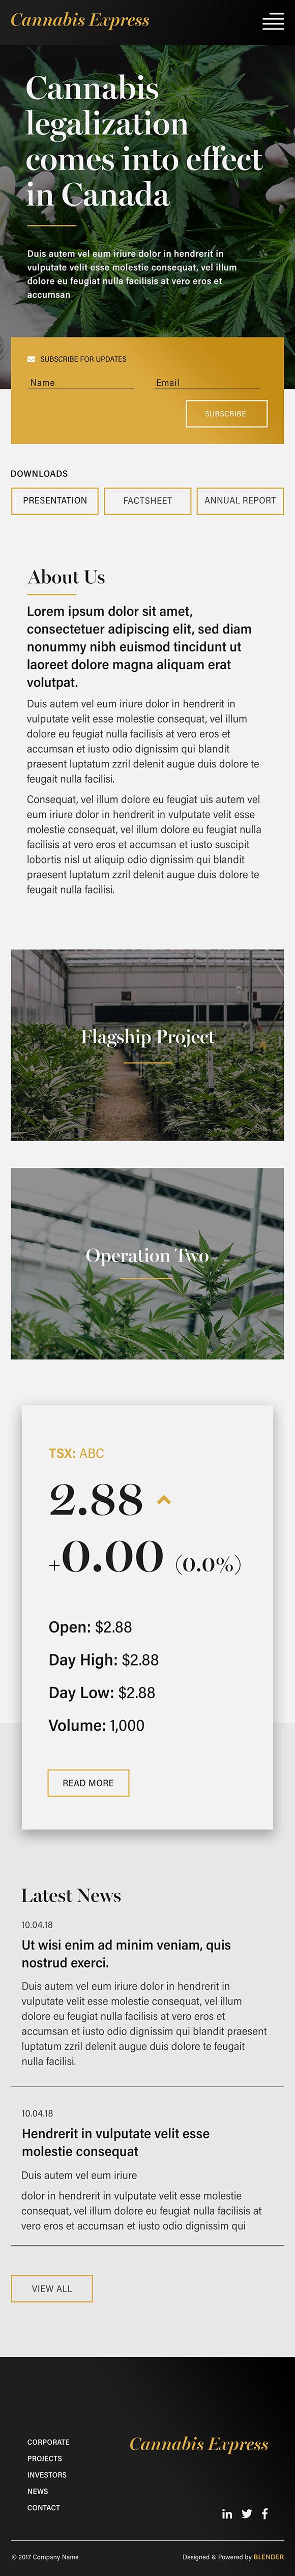 Cannabis Express